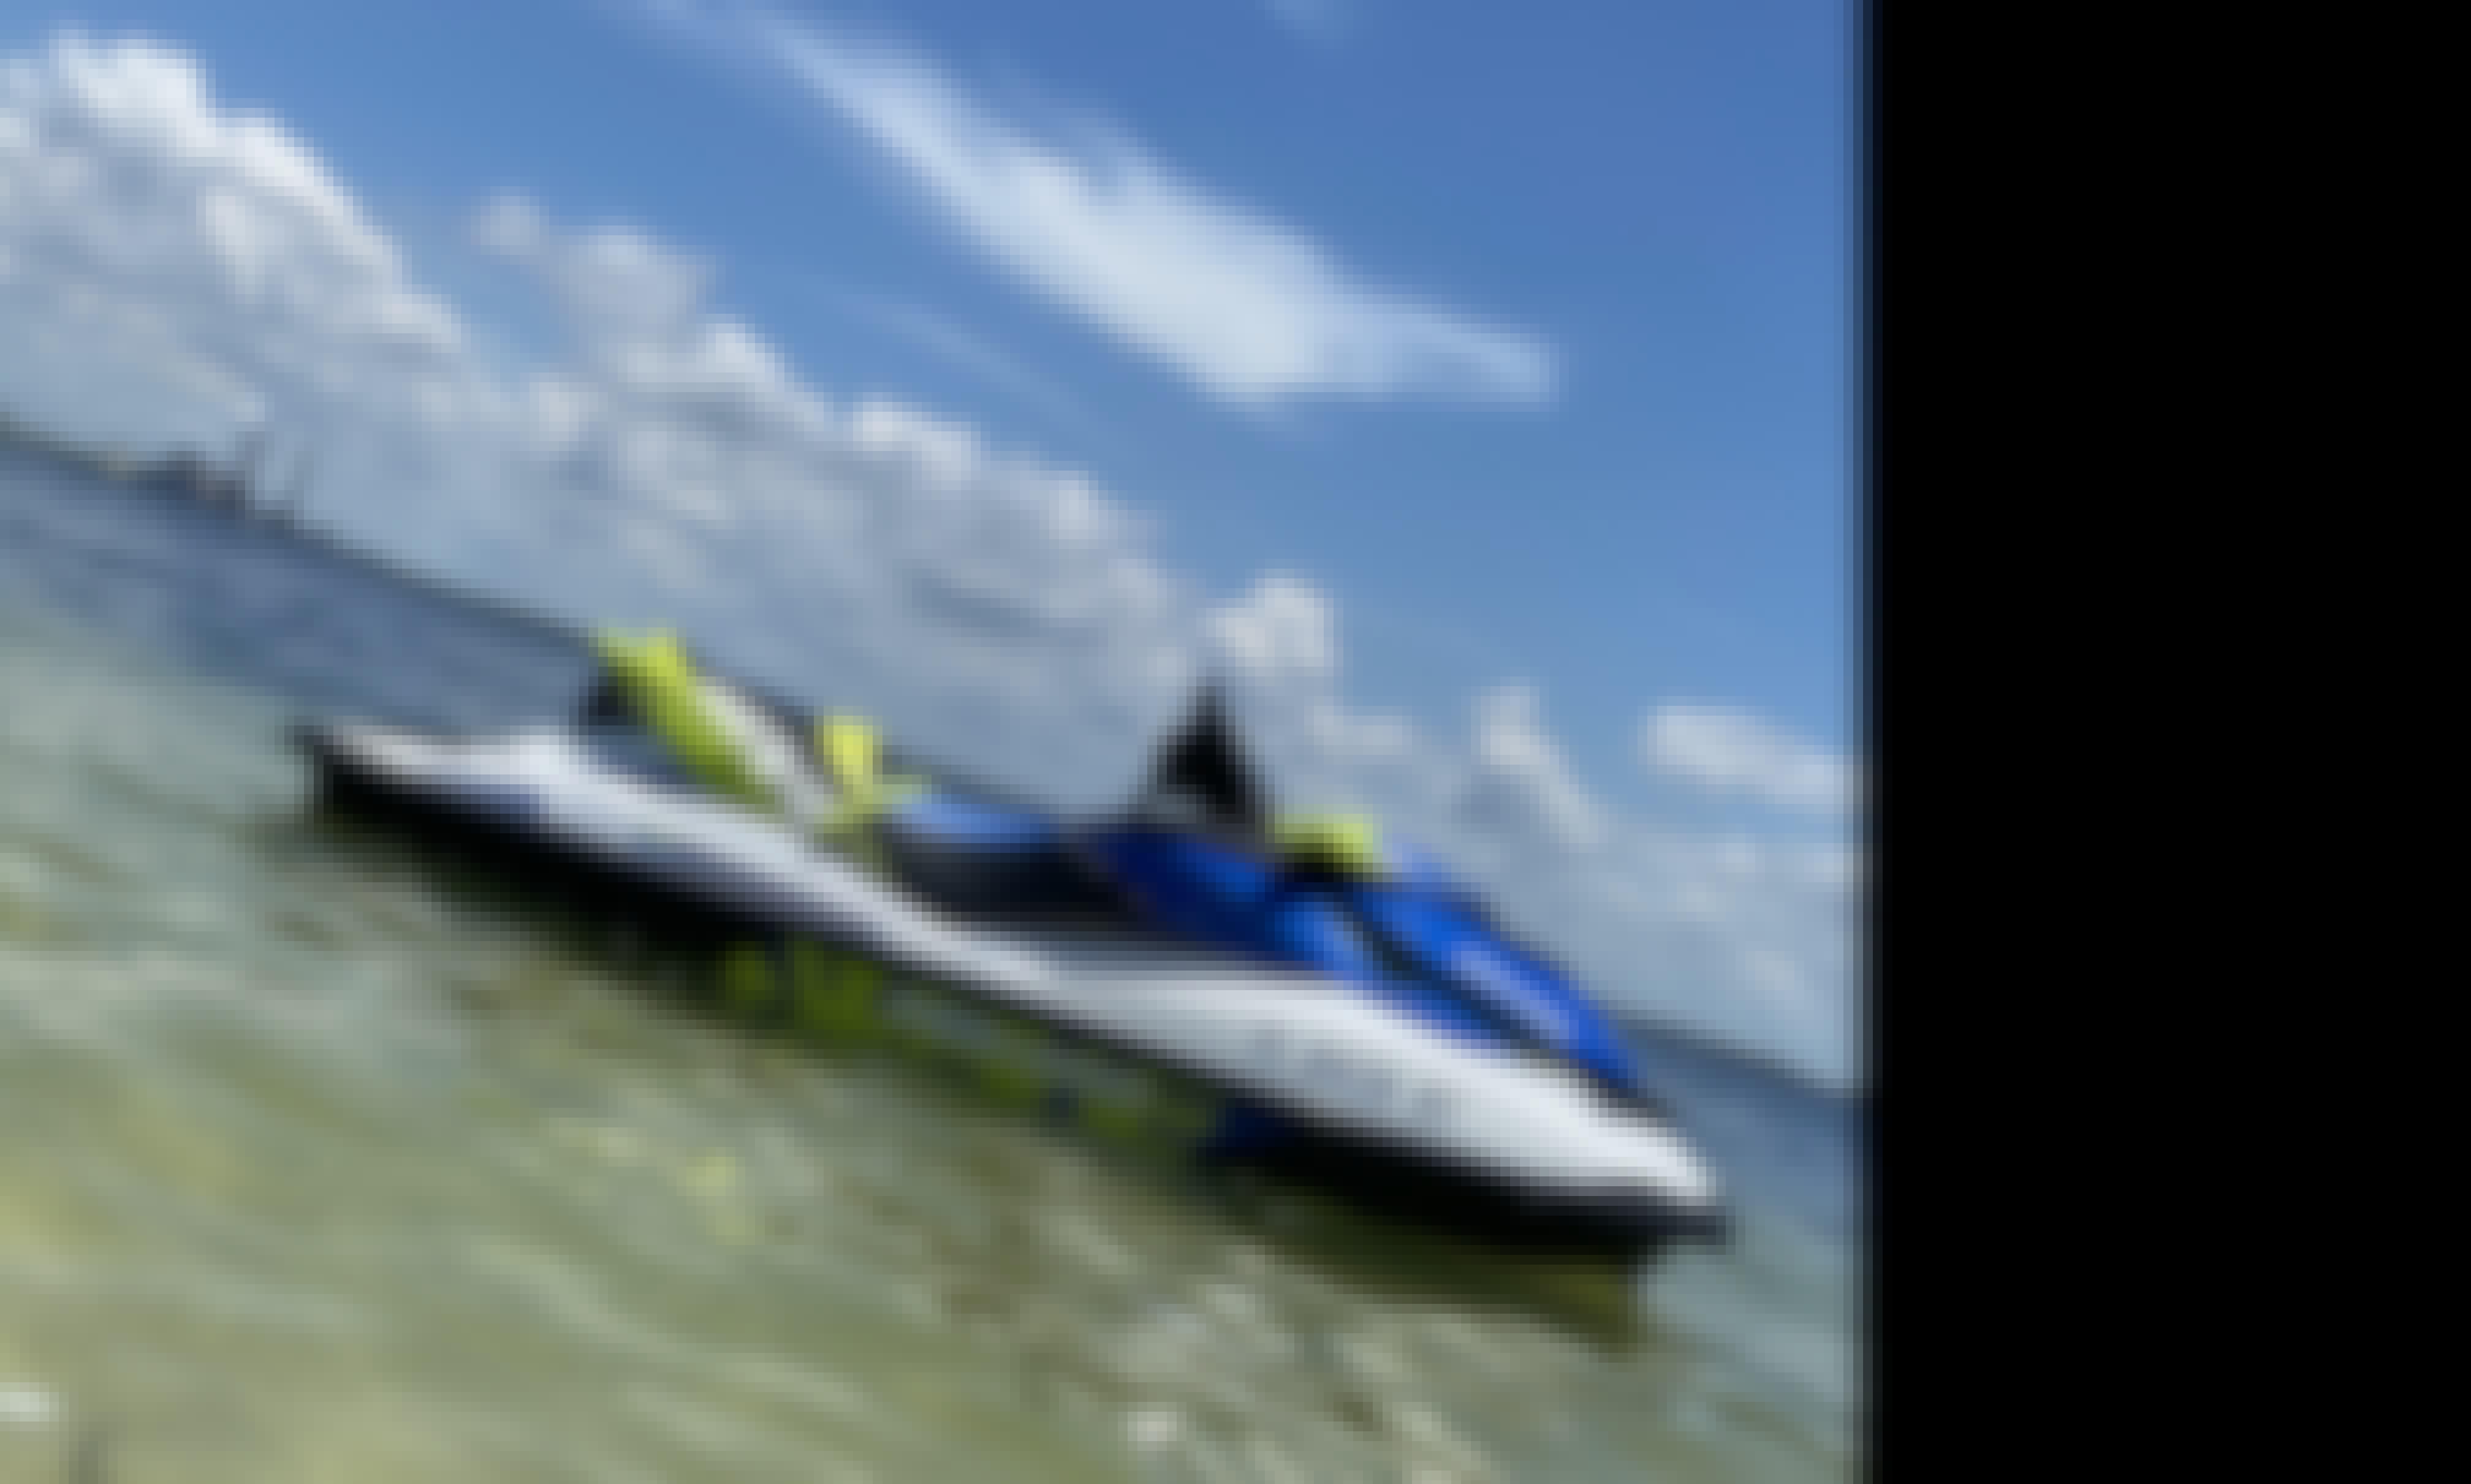 Sea Doo Rental in Dunedin and Tampa Bay Area in Florida!